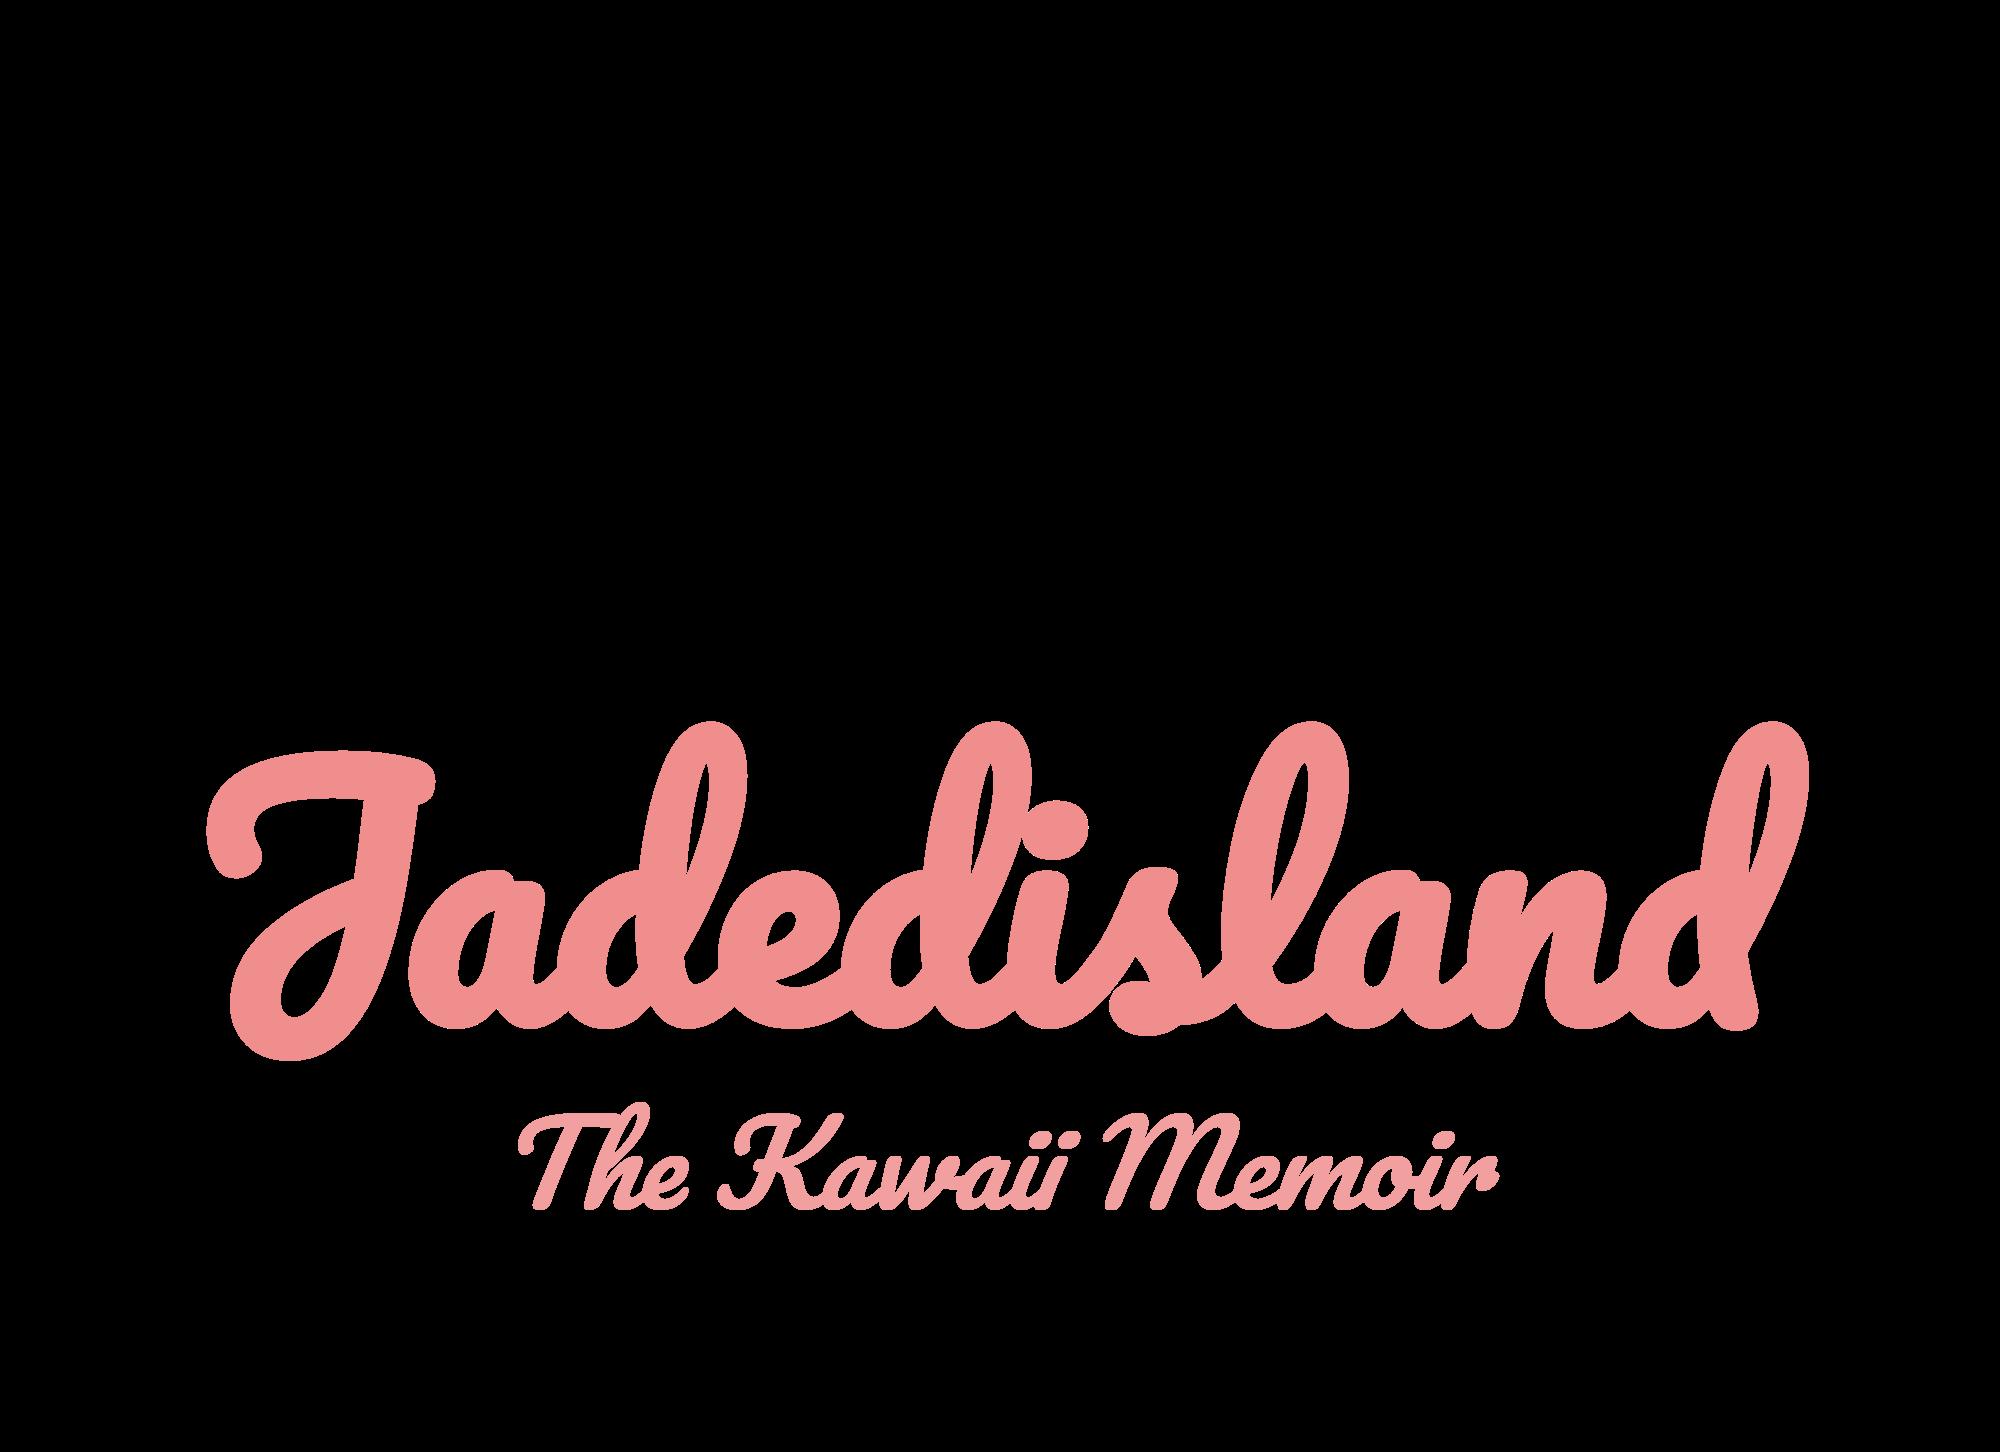 Jadedisland-logo.png